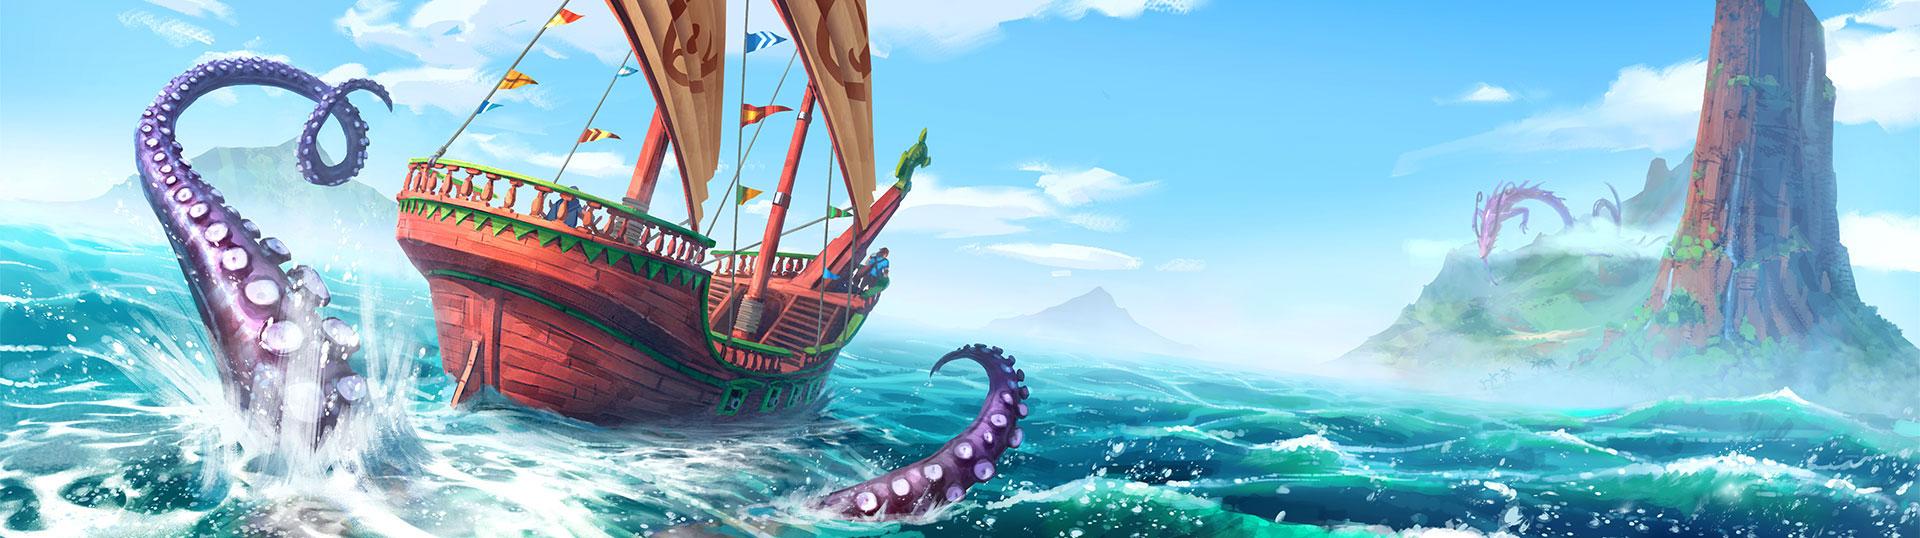 RuneScape Summer 2016 Hiscores